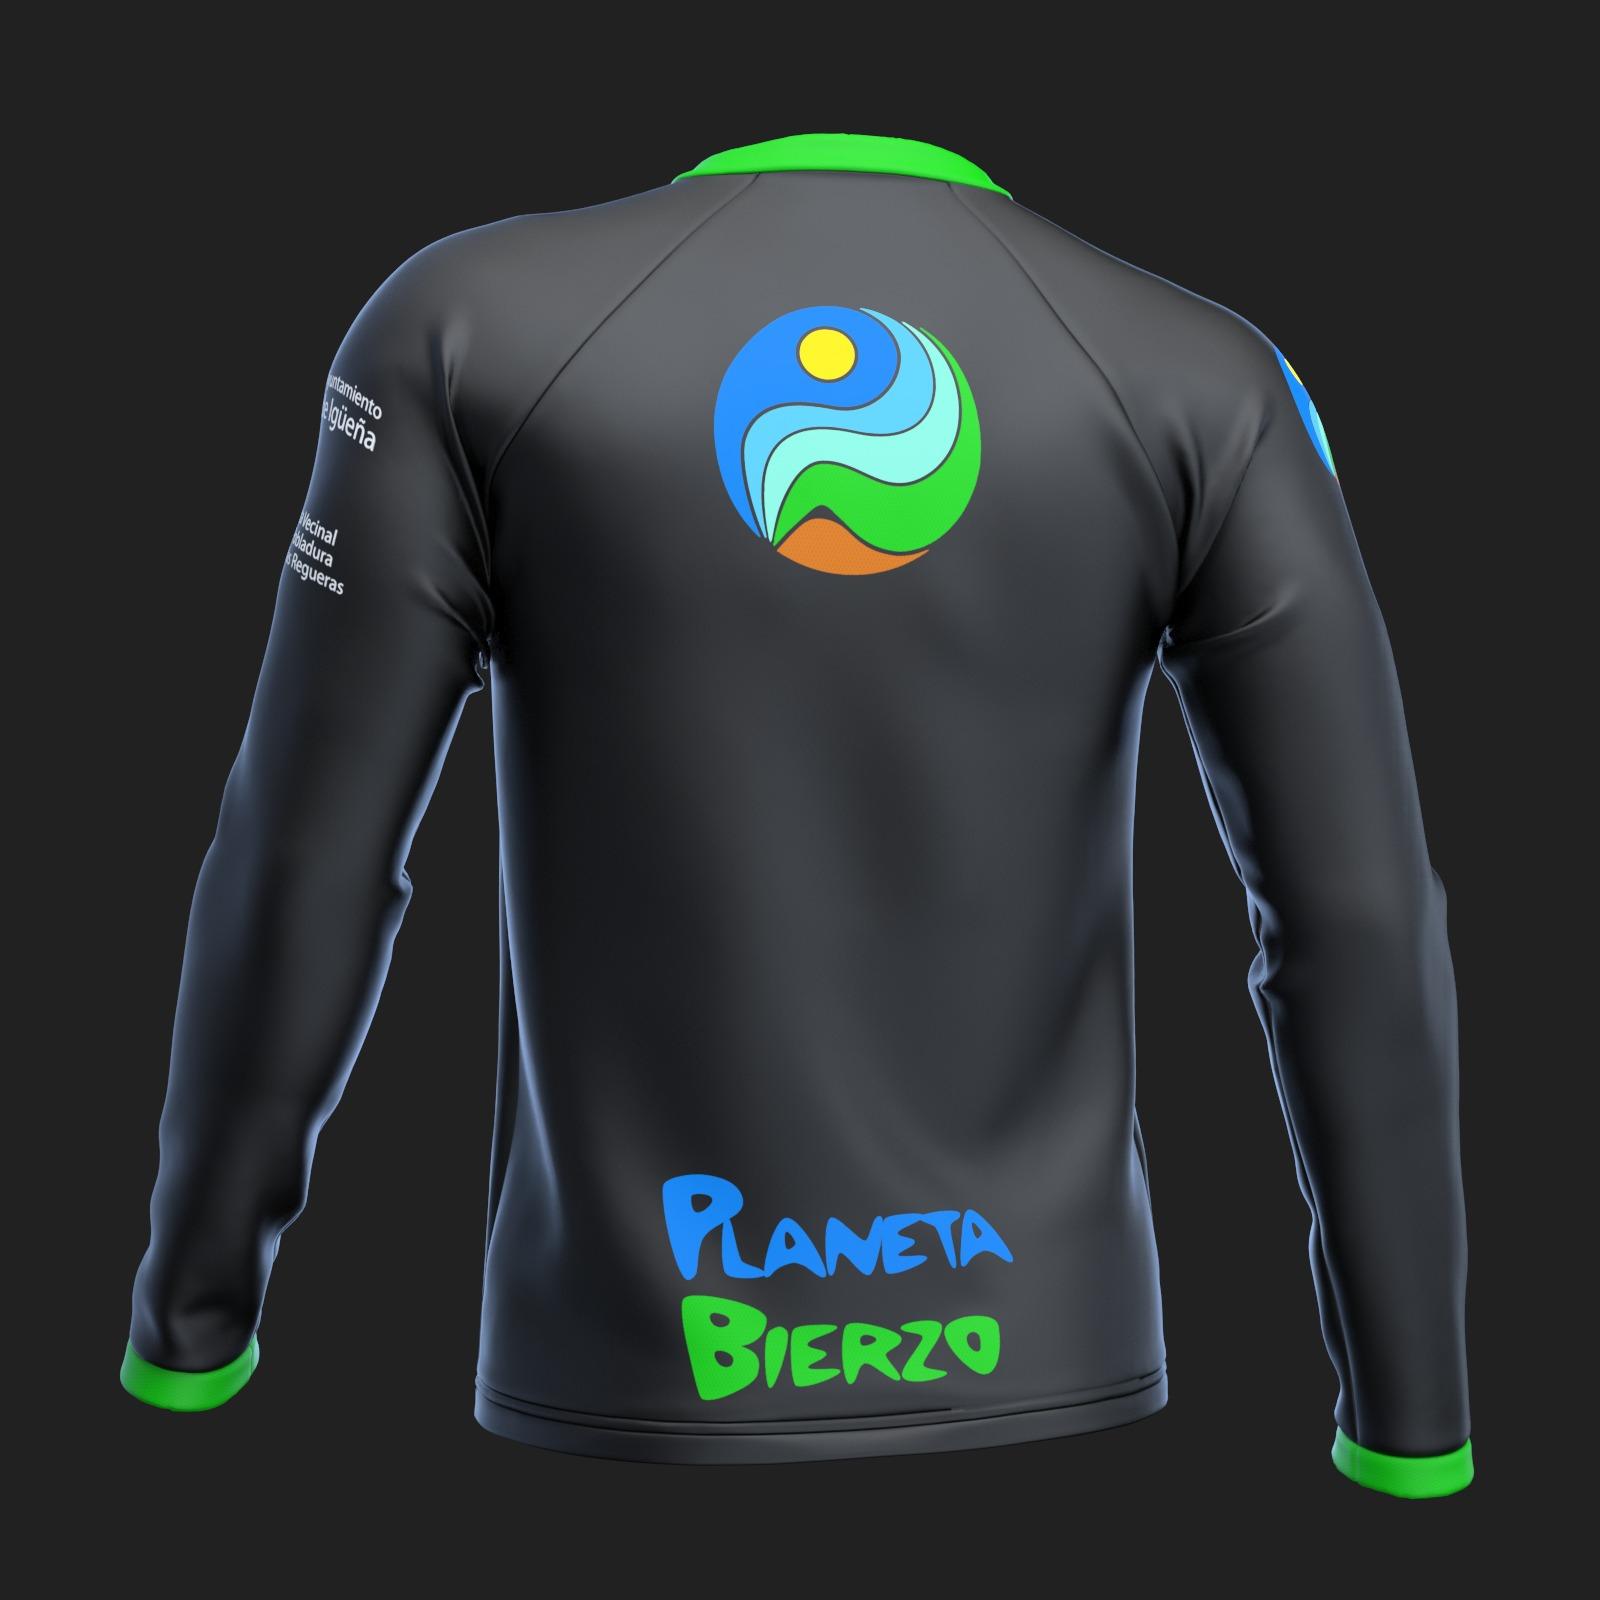 Camiseta Ciclismo Planeta Bierzo Santa Cruz